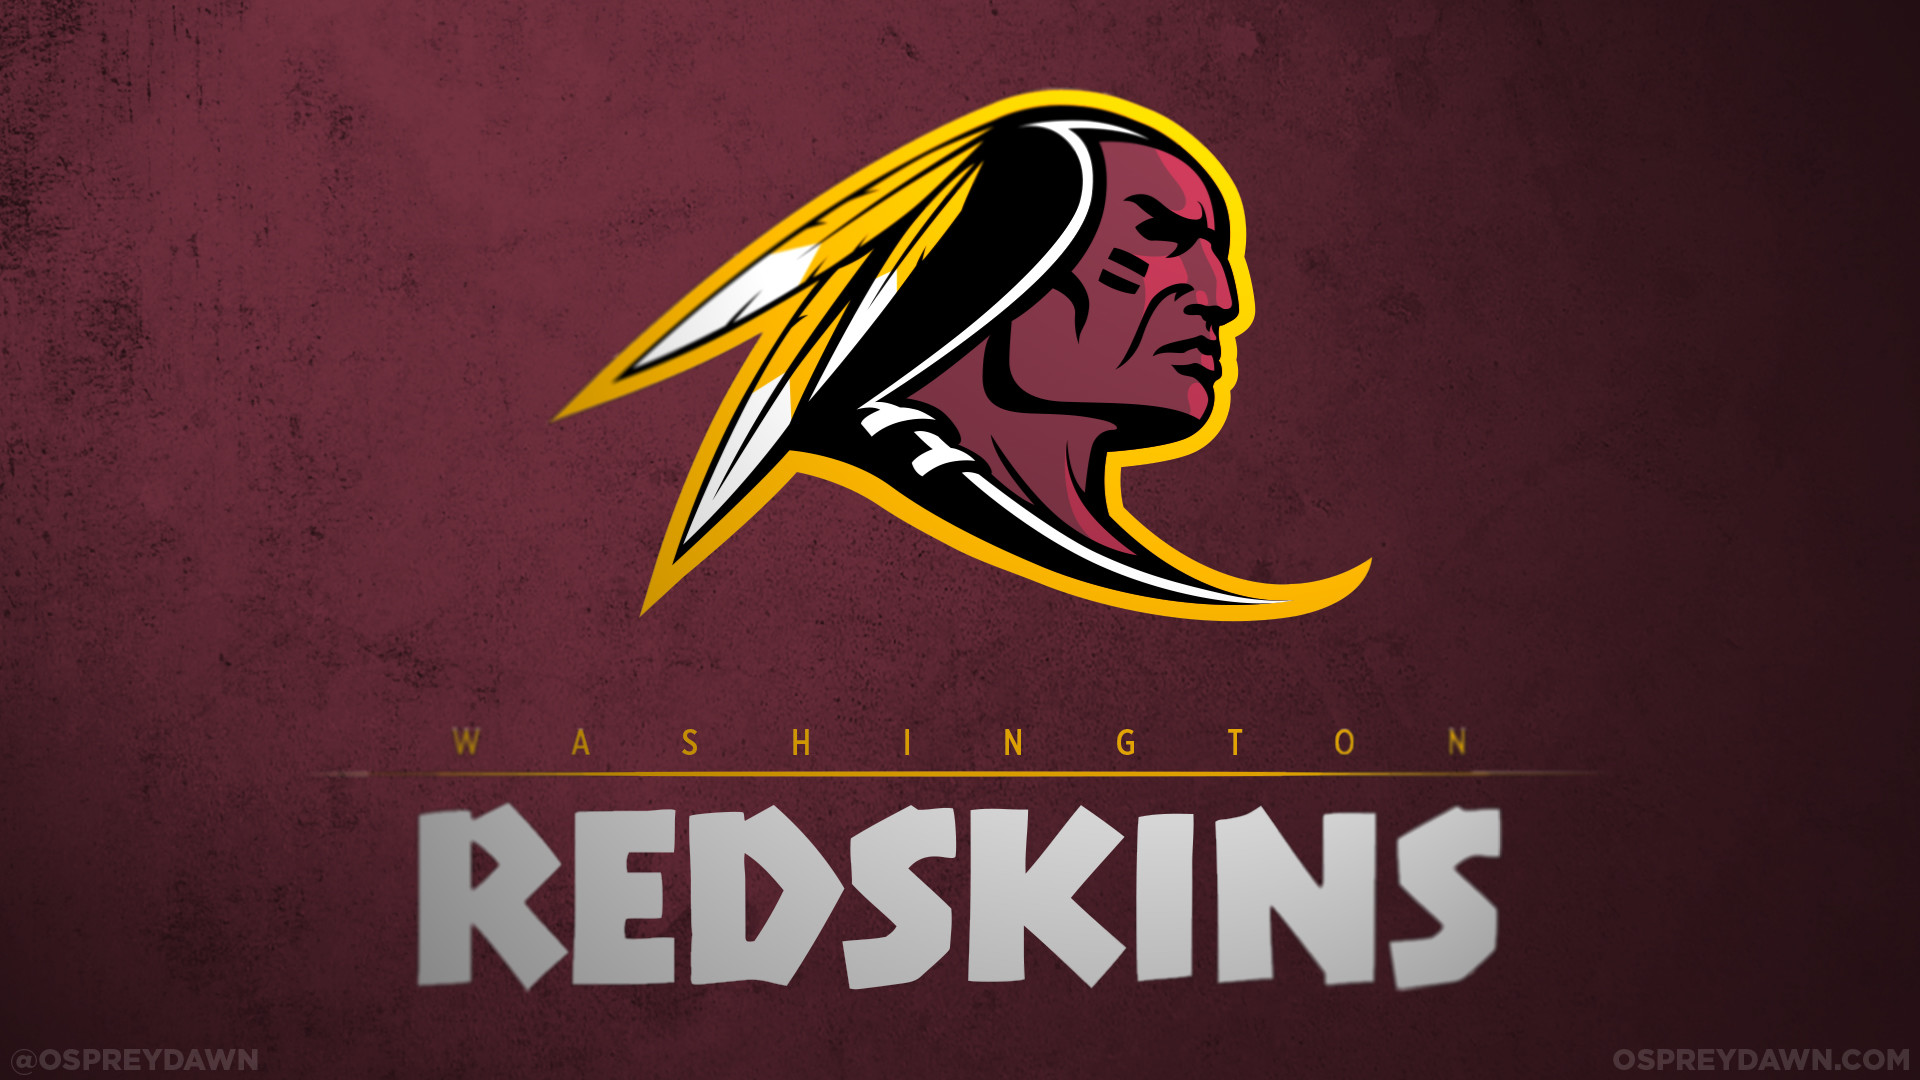 WASHINGTON REDSKINS nfl football f wallpaper | | 155270 .